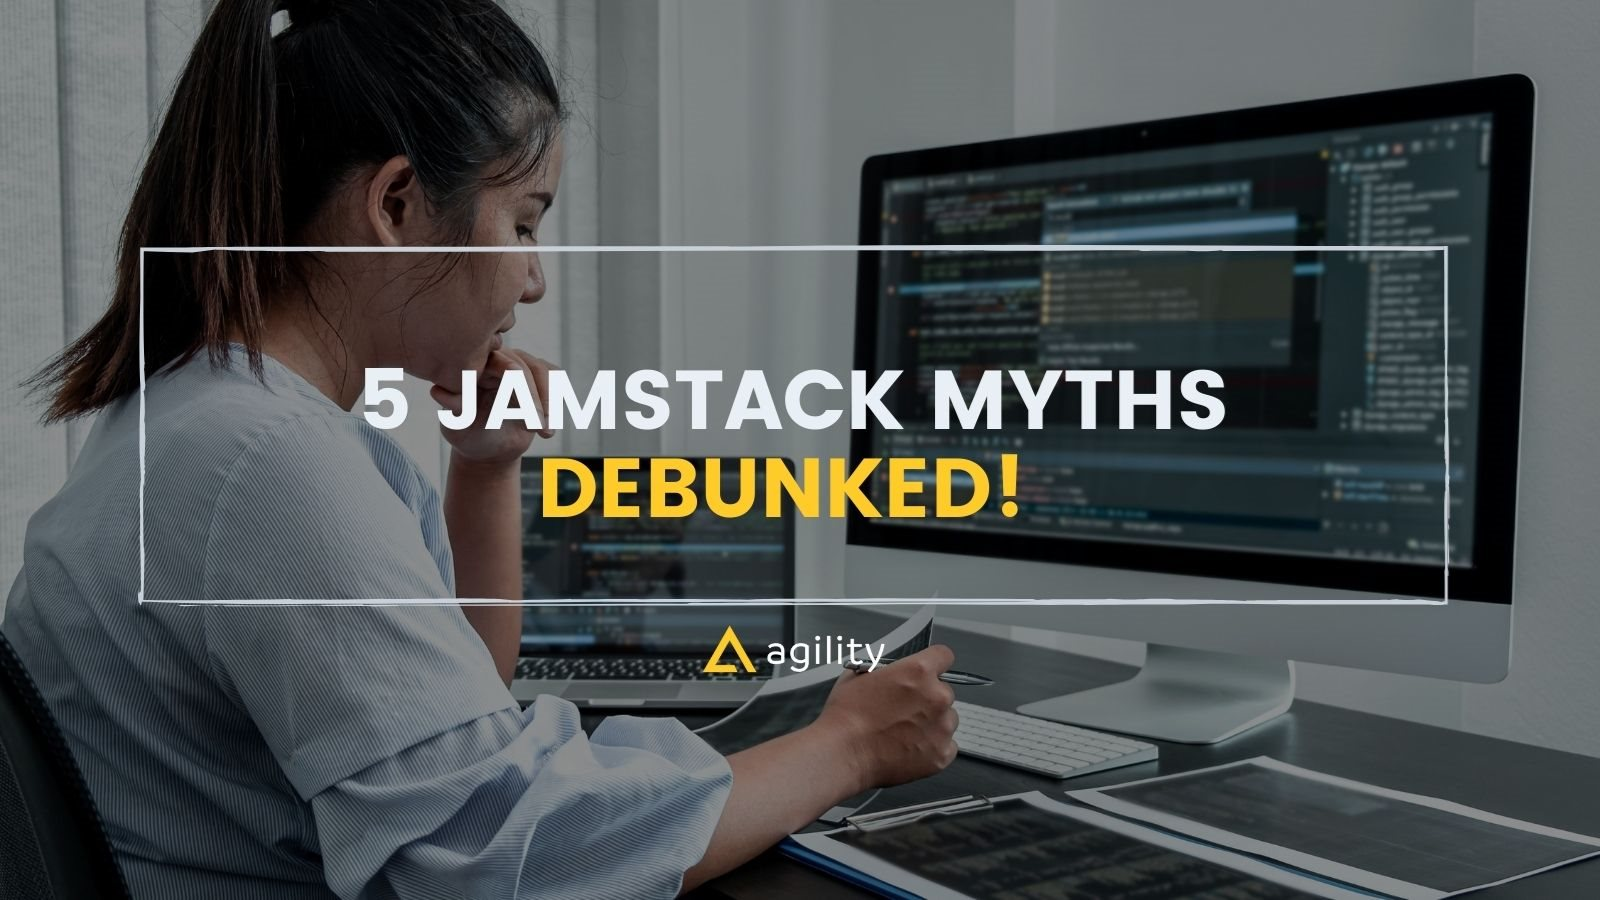 Jamstack myths debunked on agilitycms.com